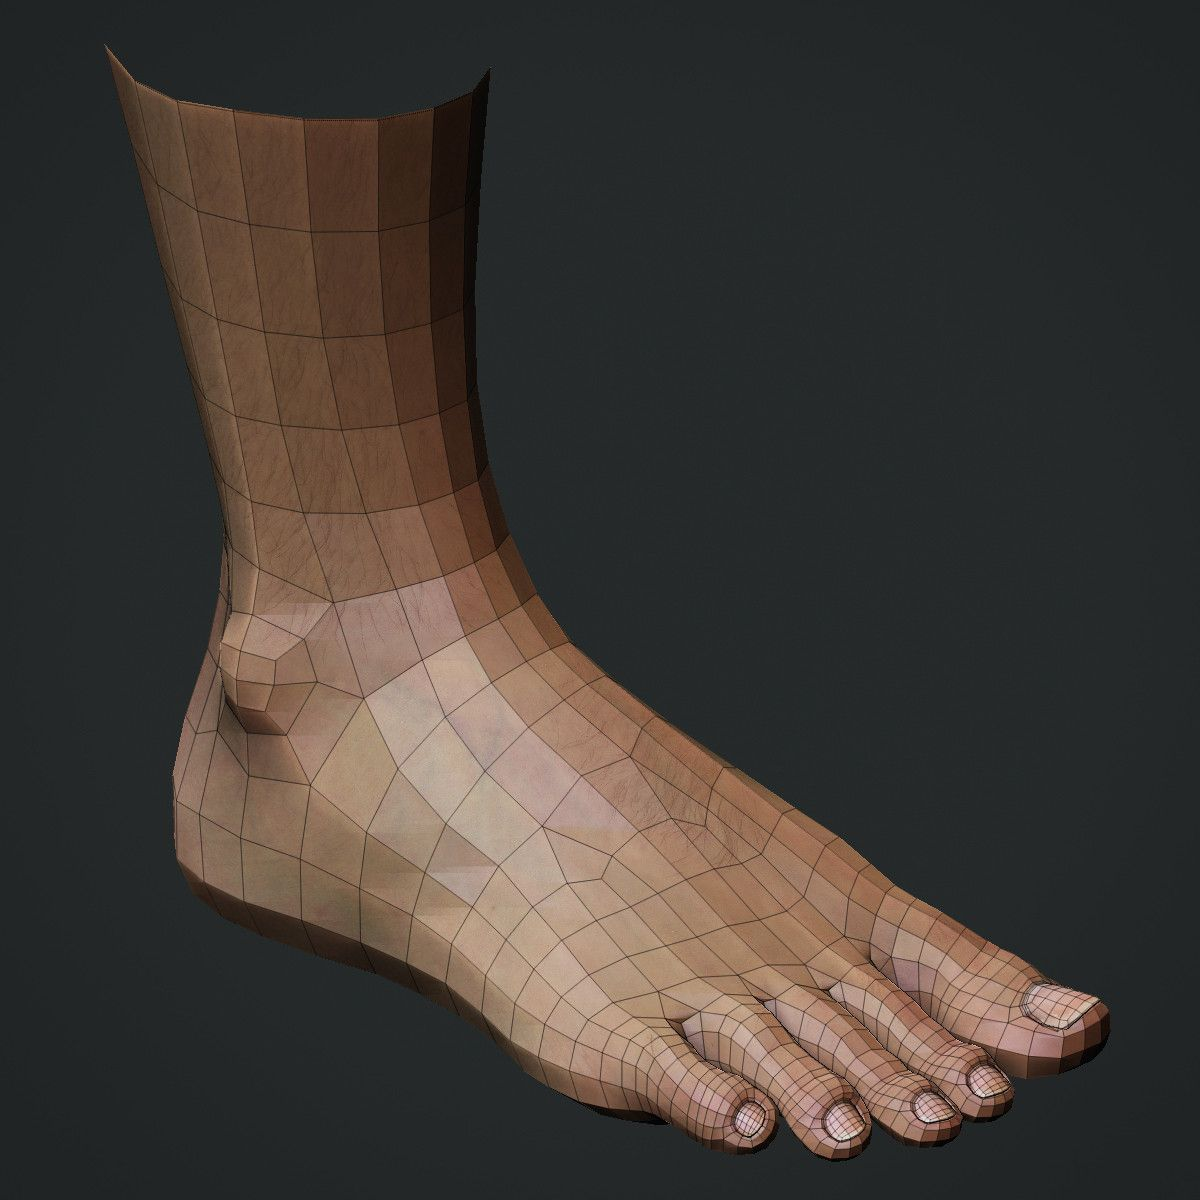 3d model realistic male foot